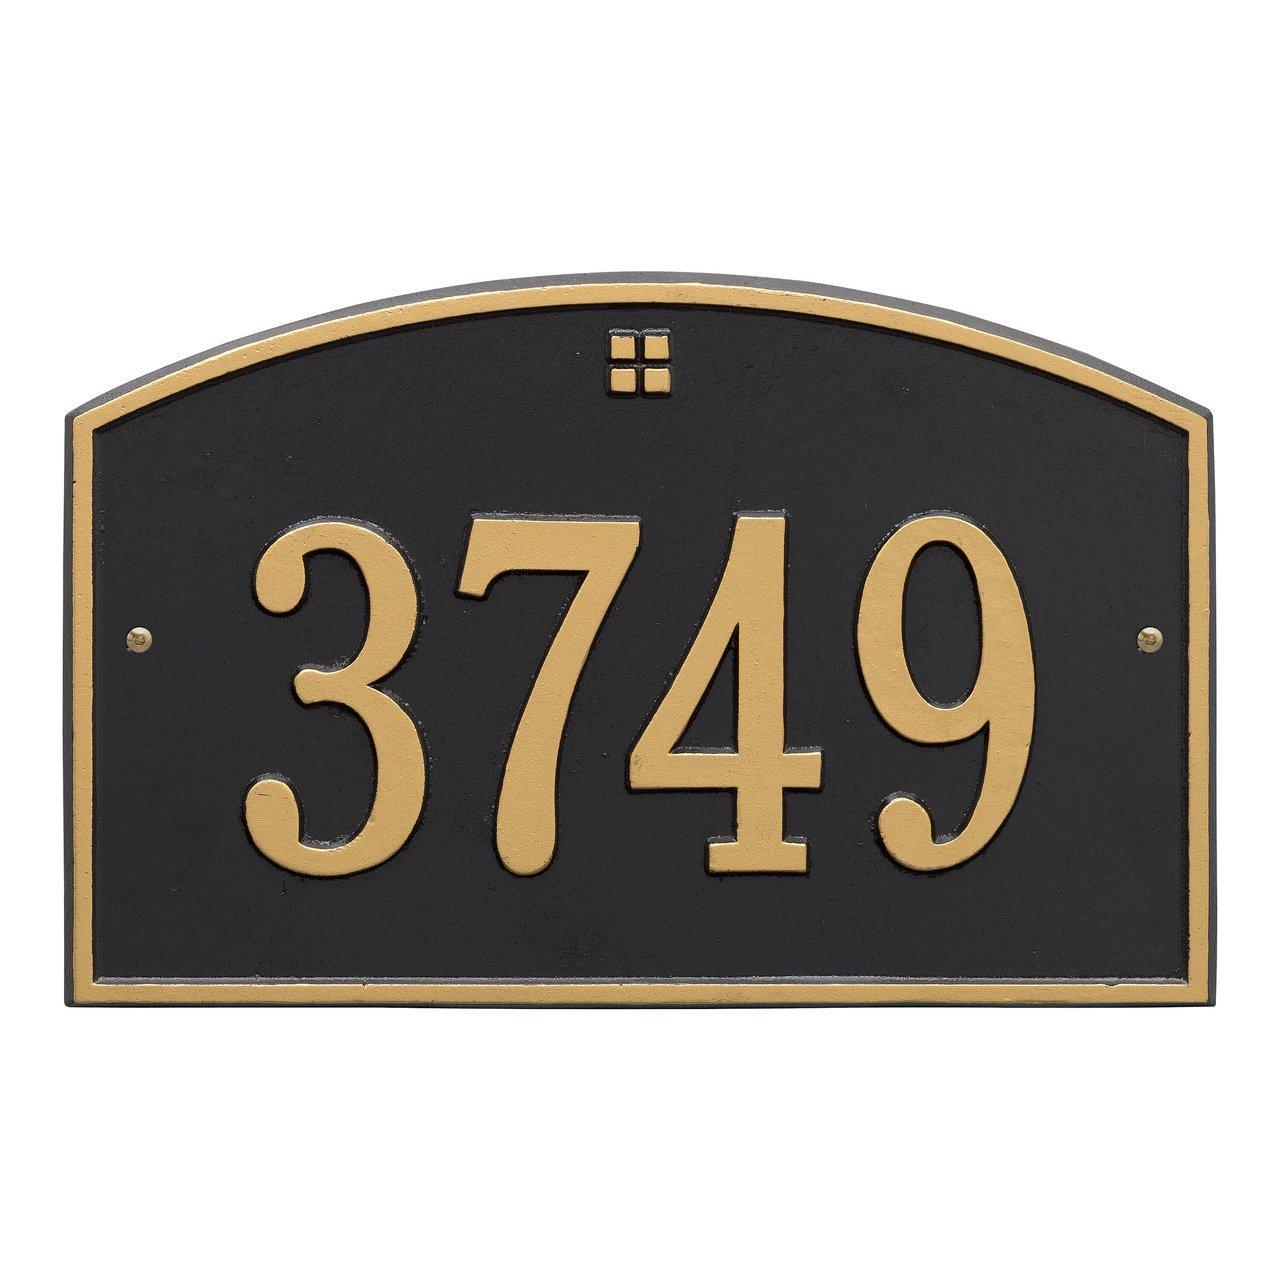 Custom 1 Line Cape Charles Aluminum Address Plaque 15''W x 9.5''H